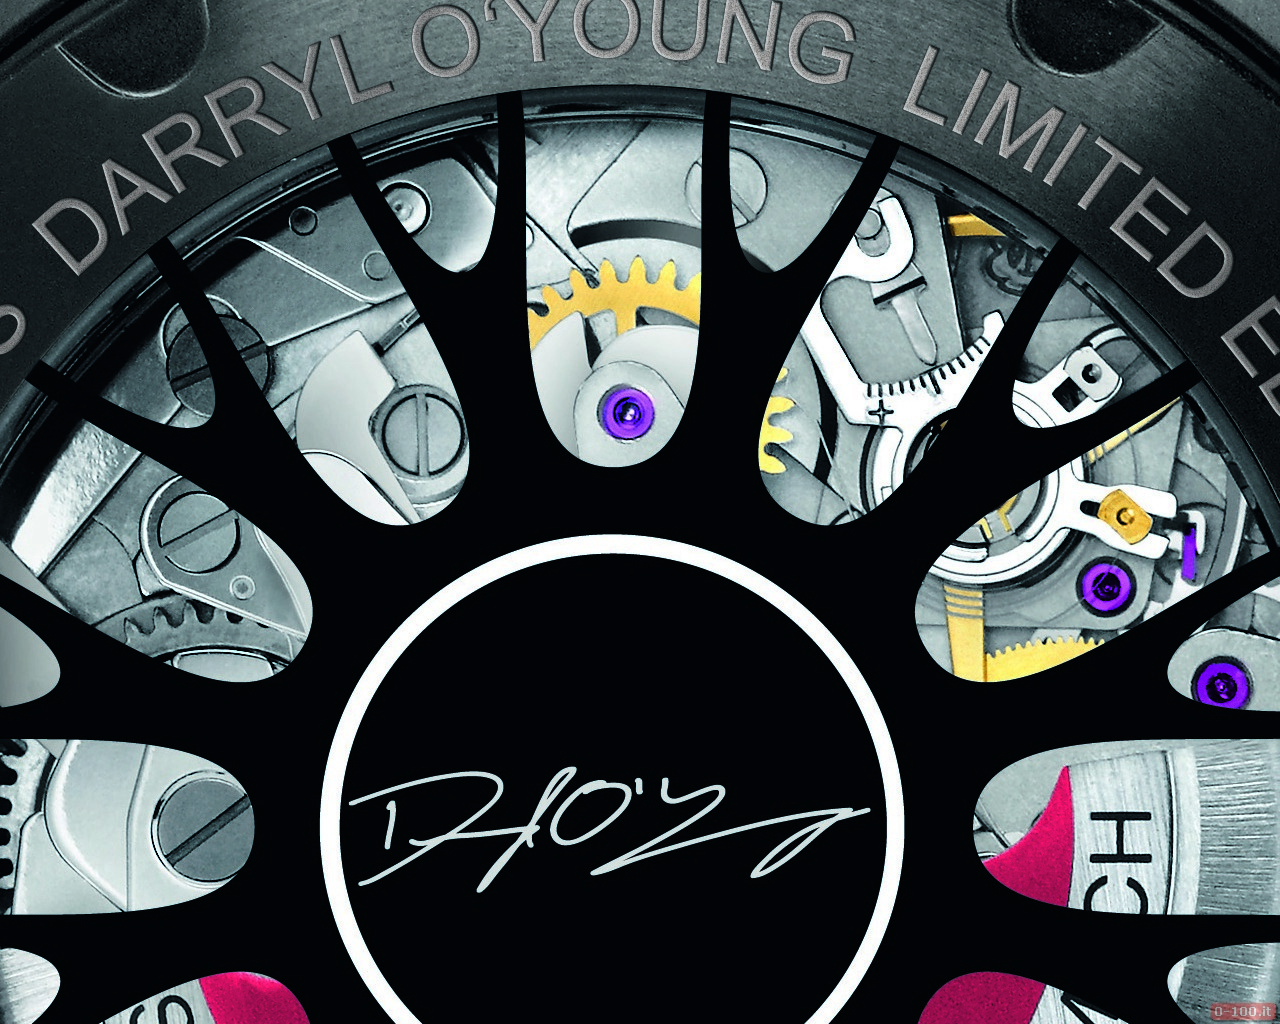 anteprima-baselworld-2014-oris-darryl-oyoung-limited-edition-prezzo-price_0-1005